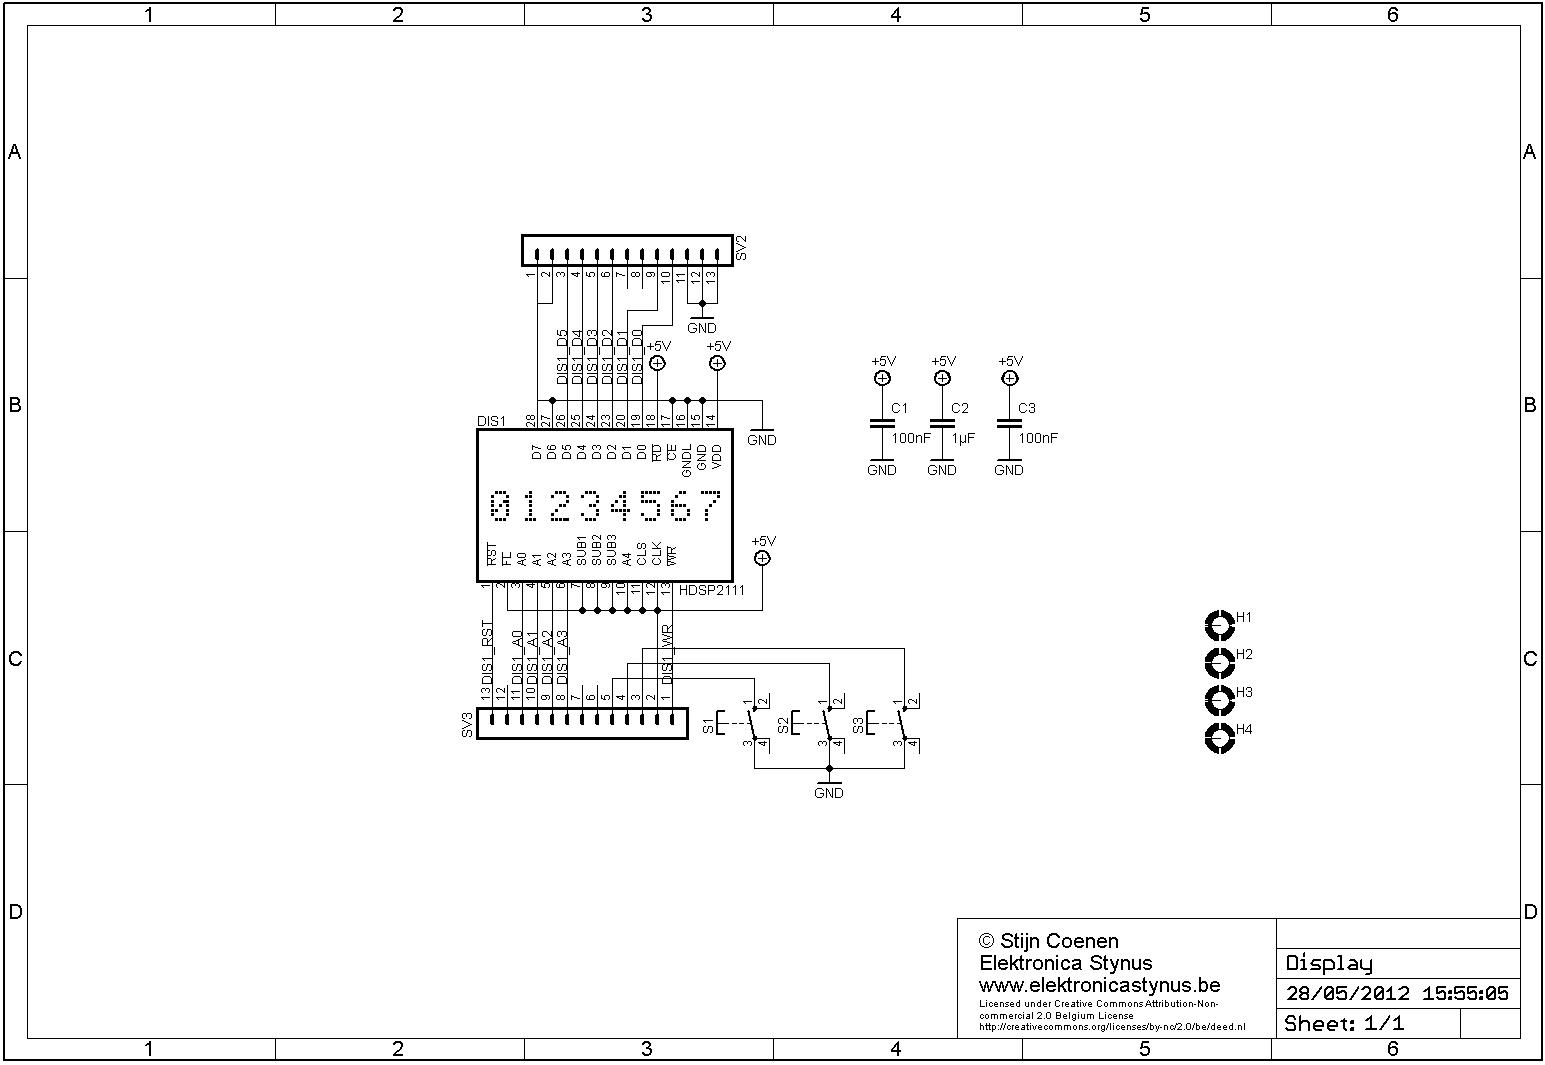 http://image.elektronicastynus.be/82/Schema_Display_Print.png